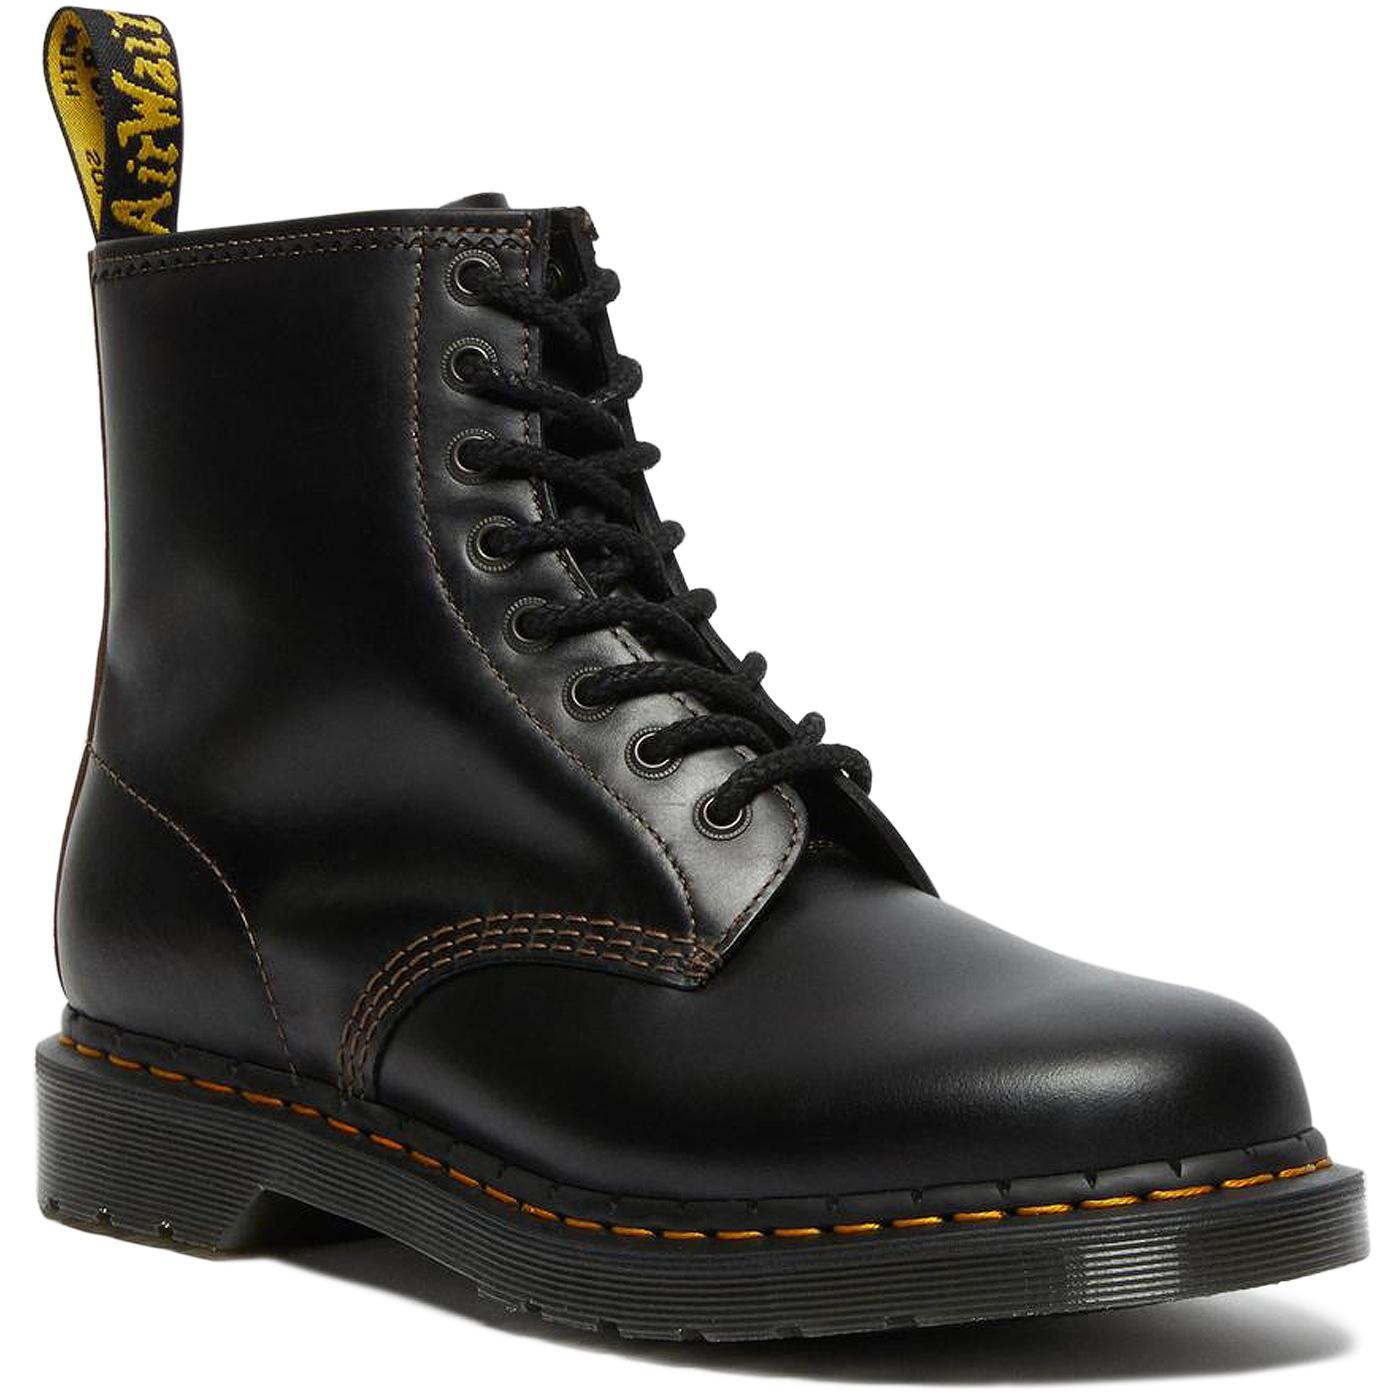 1460 DR MARTENS Abruzzo WP Boots - Black/Brown